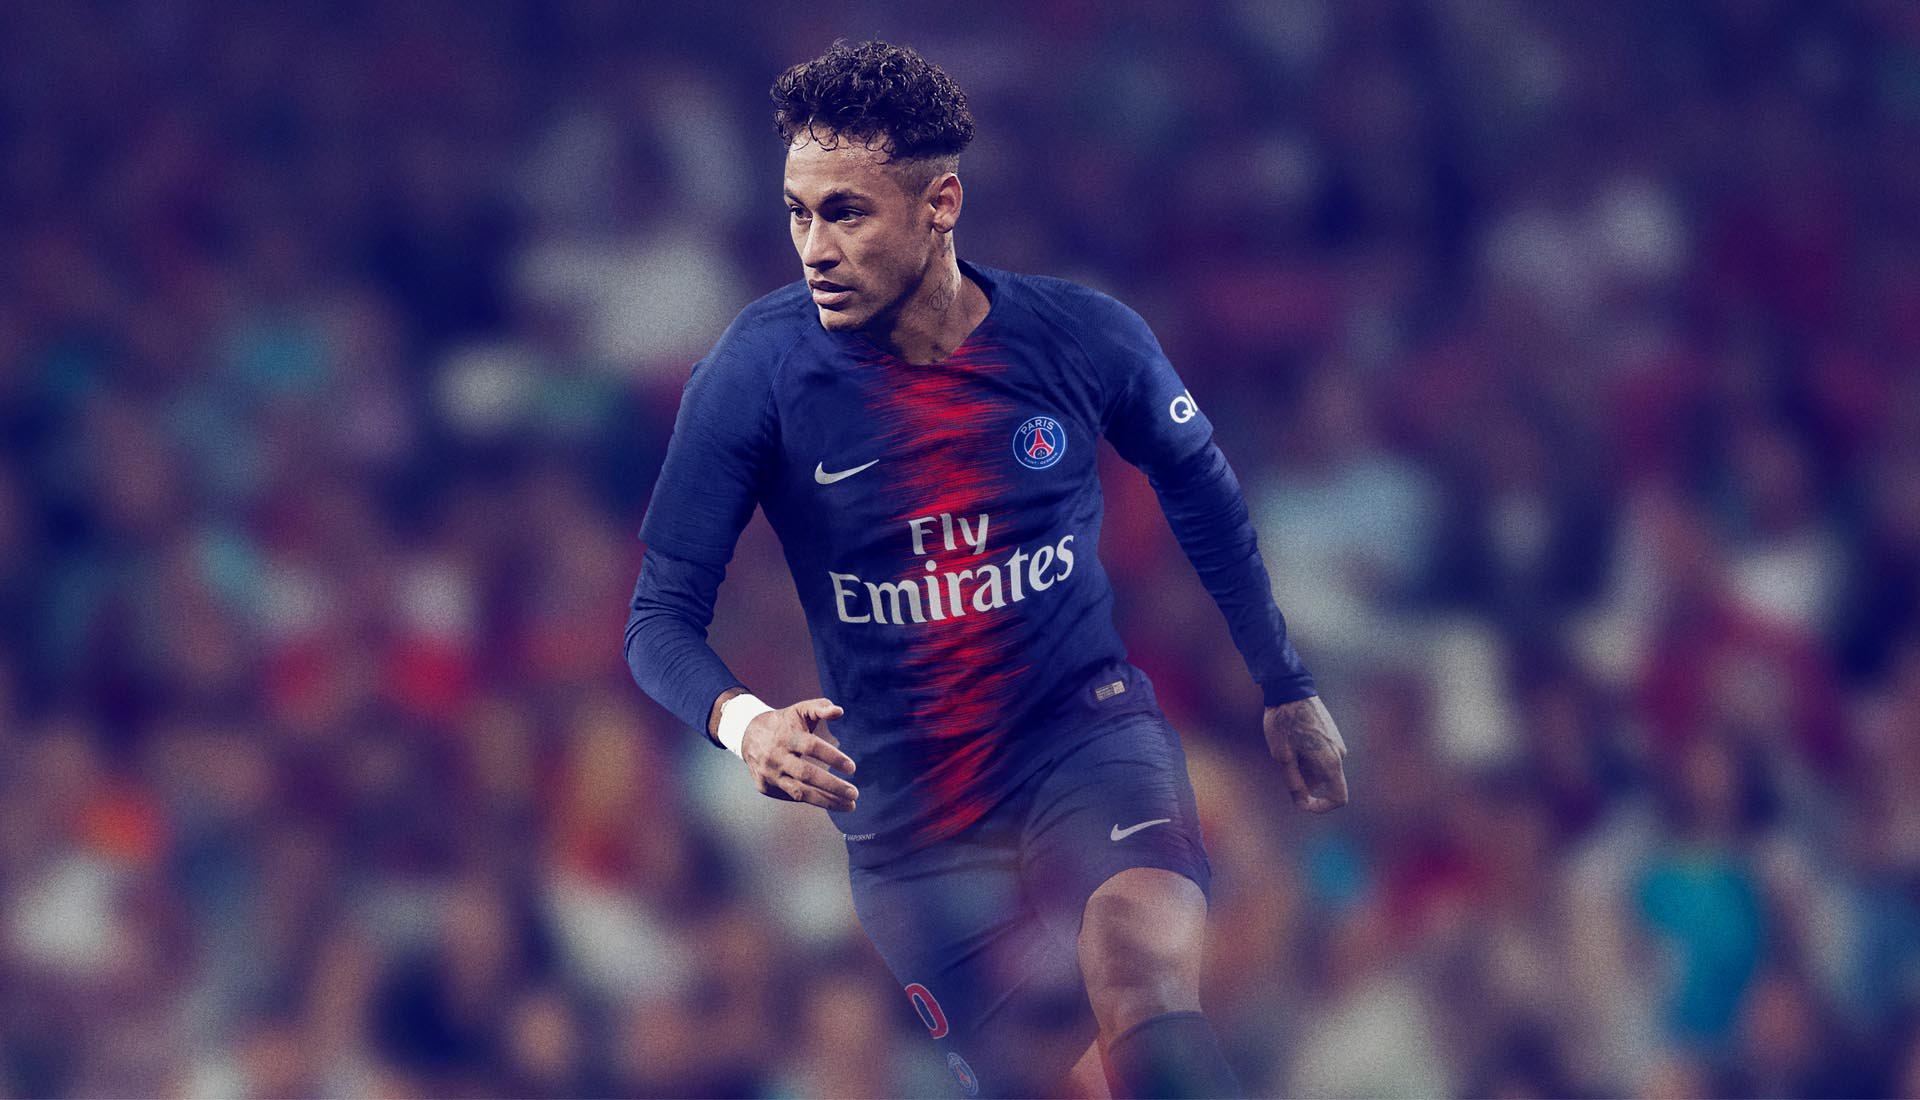 PSG Thuisshirt 2018-2019 Neymar